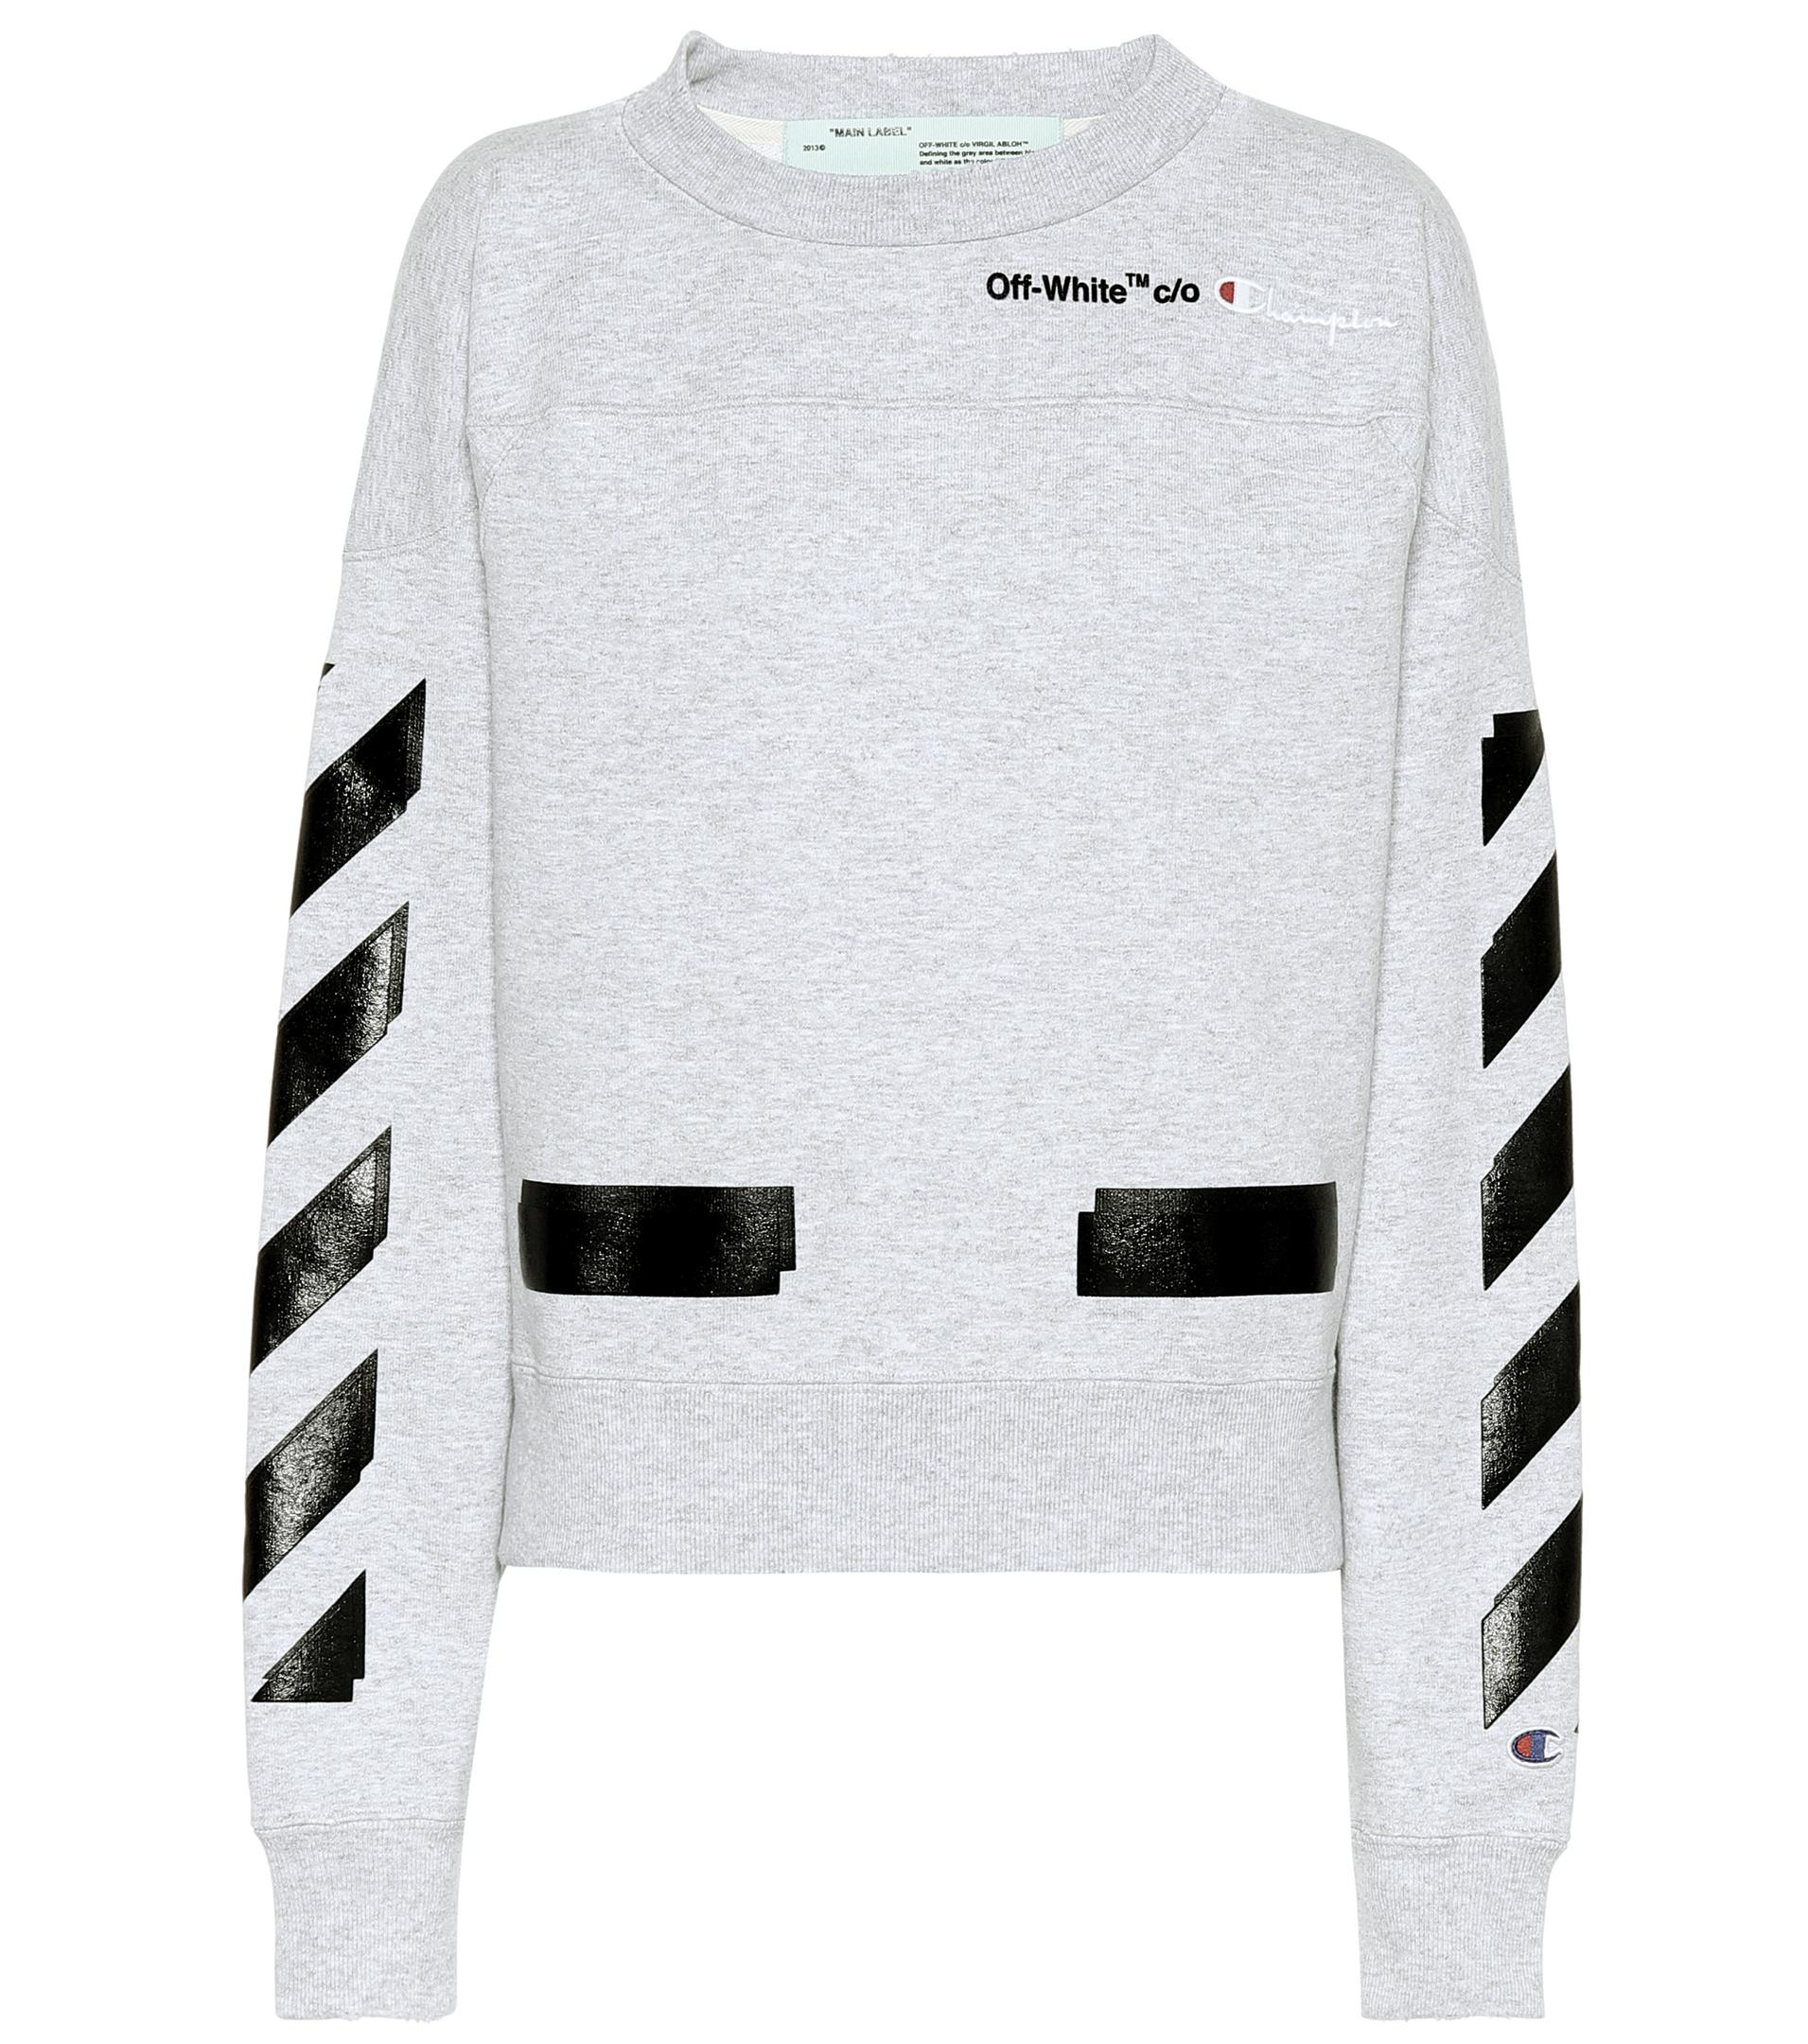 d930abff3ee9 Off-White c o Virgil Abloh X Champion Printed Sweatshirt in Gray - Lyst